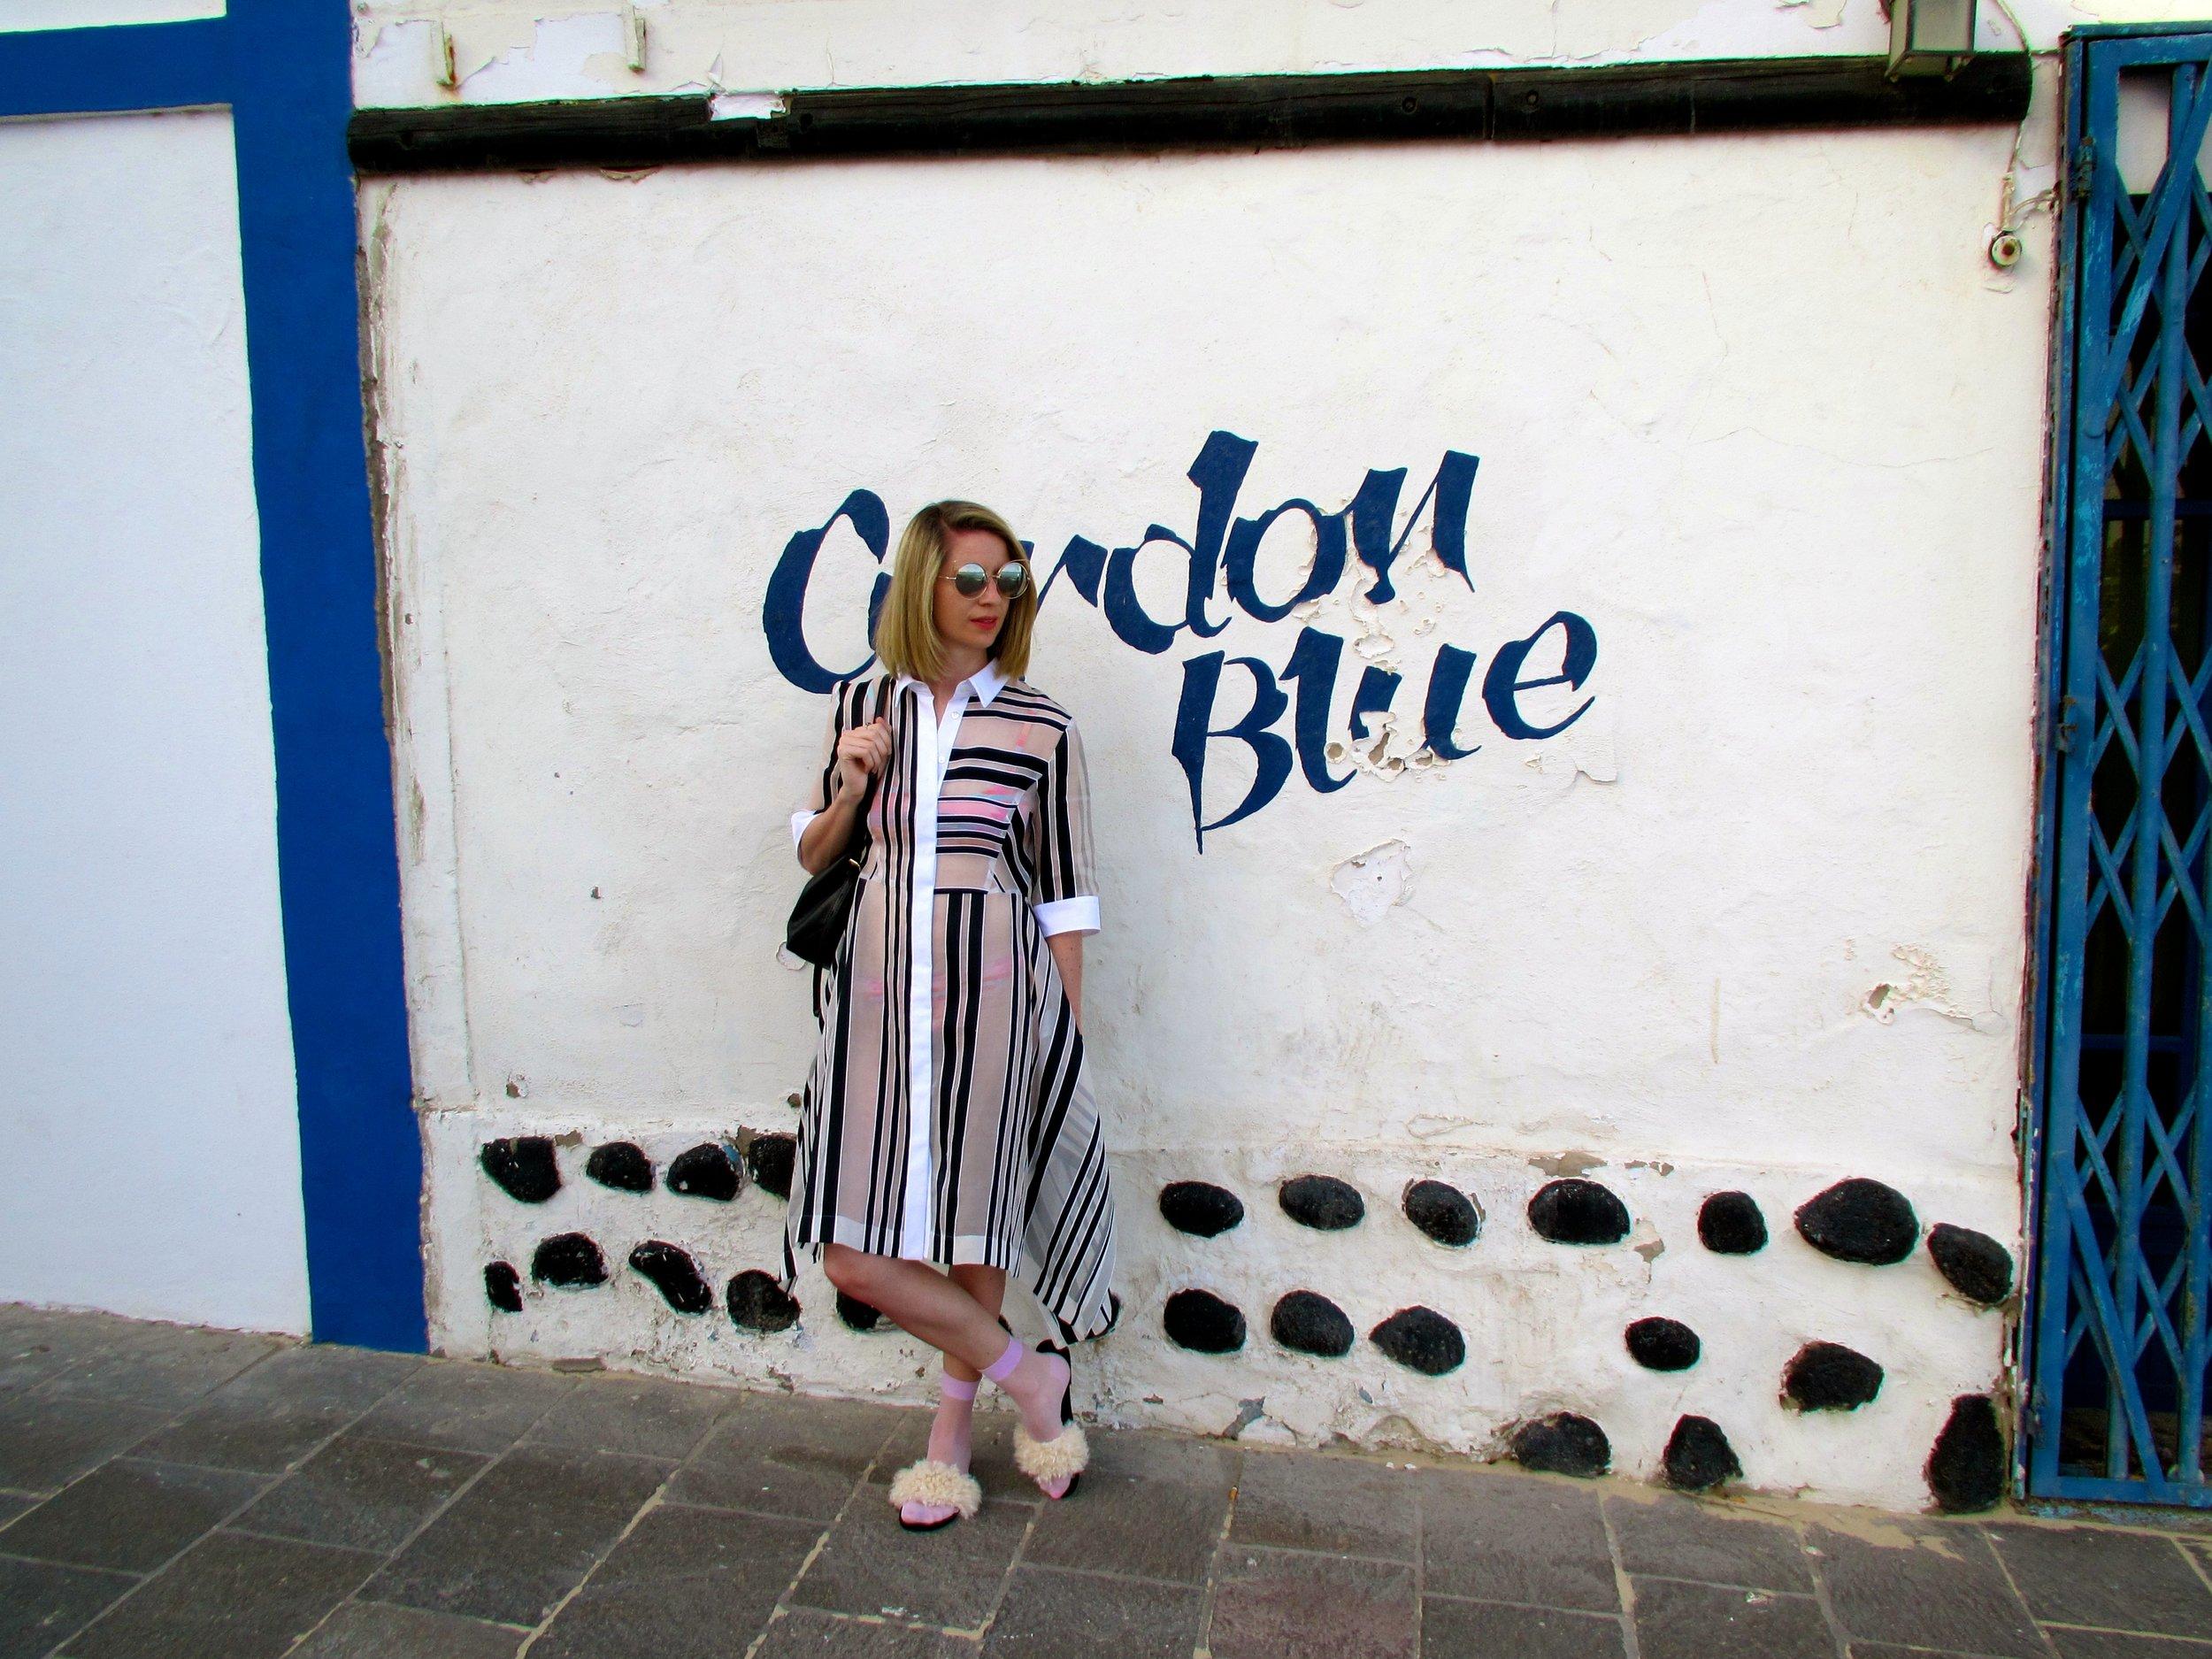 Striped sheer shirt-dress, Sportsmax, multi-coloured bikini, Topshop, fluffy sliders, Zara, pink sheer socks, Cos, cat-eye sunglasses, Topshop